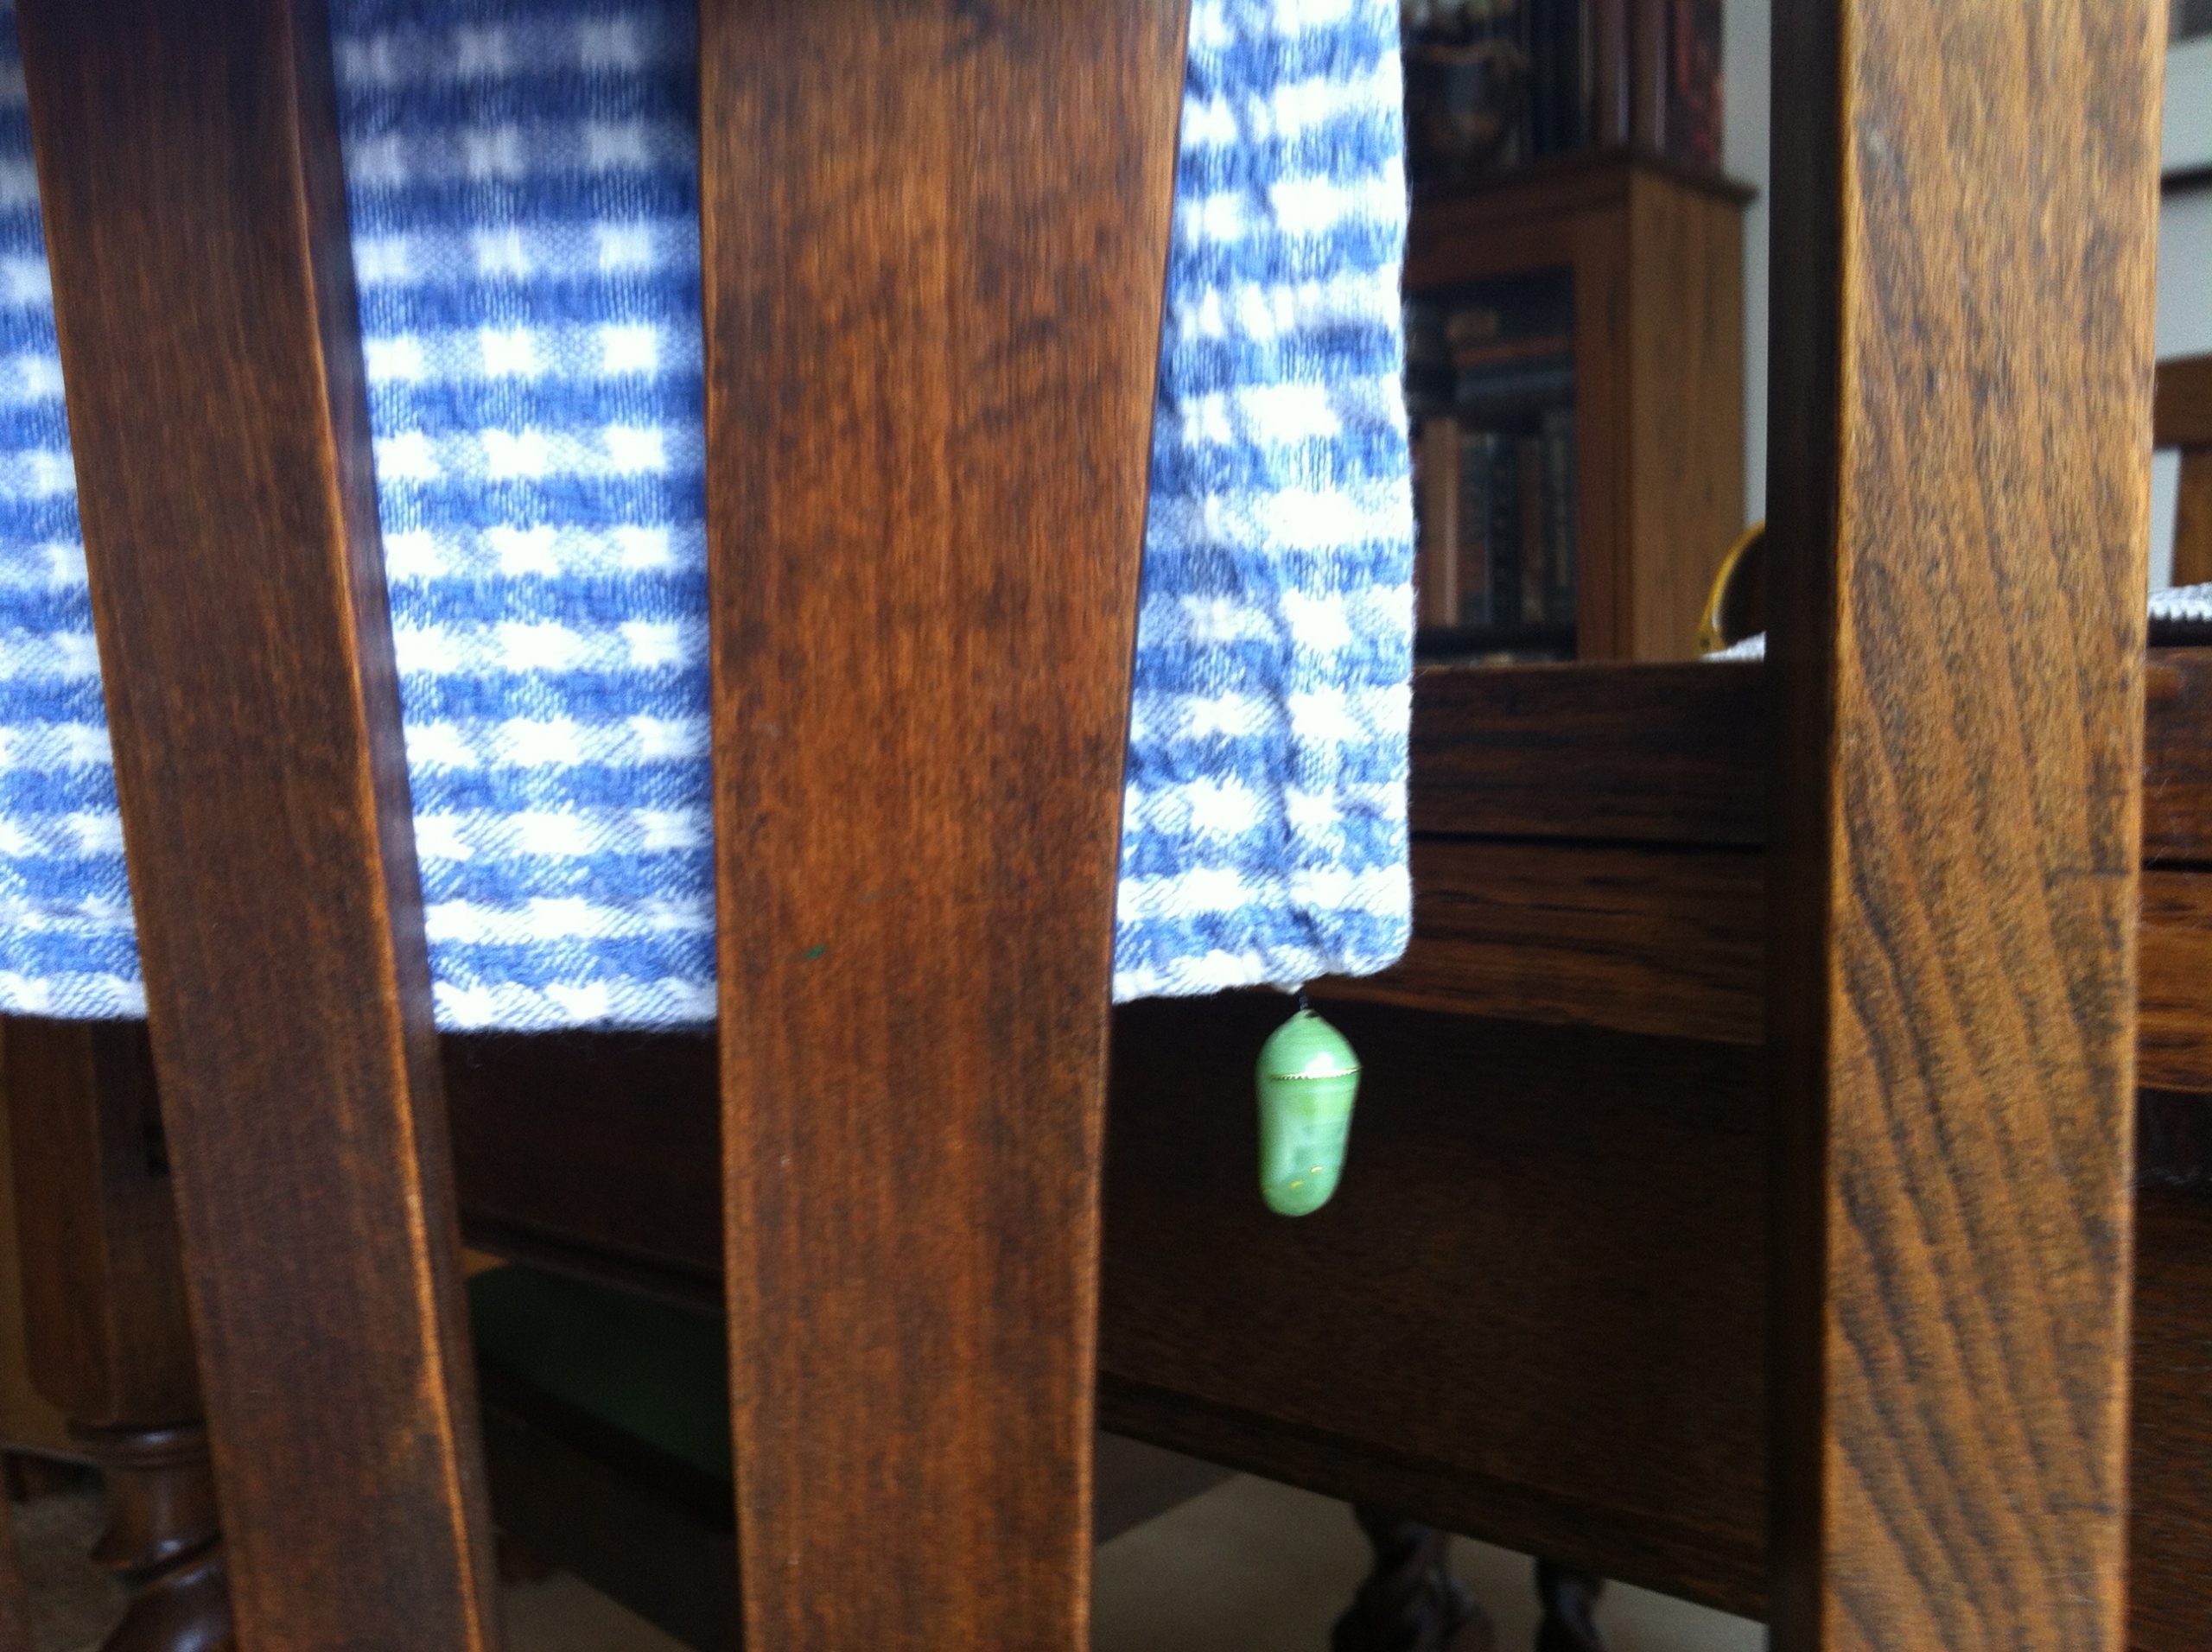 MOnarch chrysalis on napkin